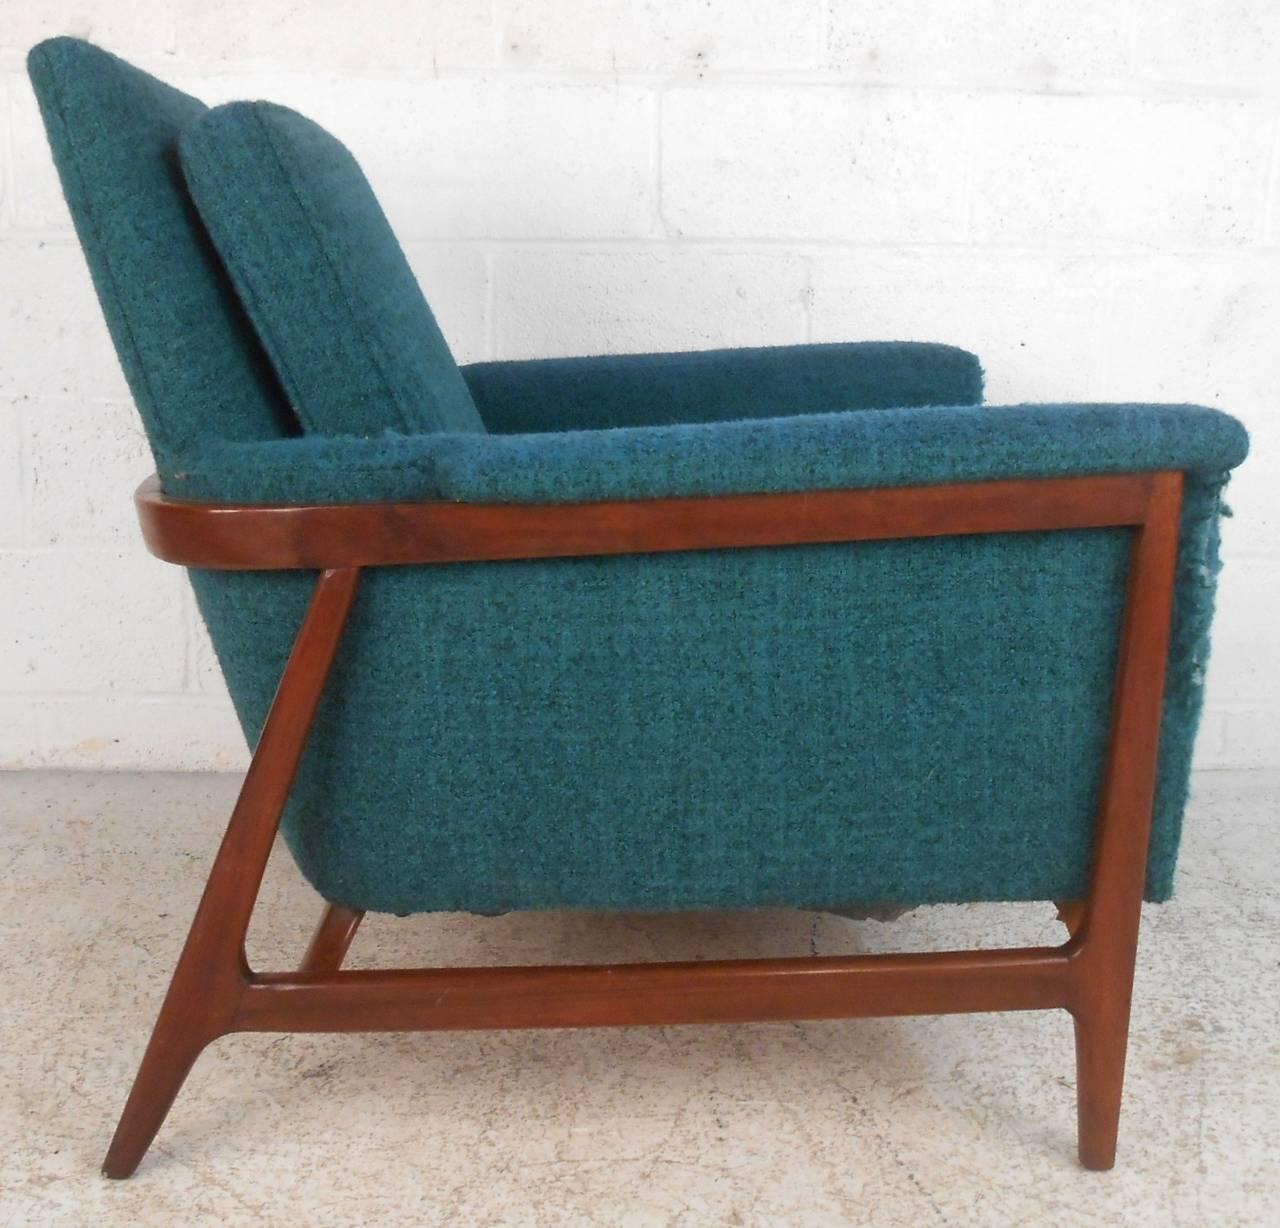 Mid century modern adrian pearsall style armchair at 1stdibs for Mid century modern armchairs